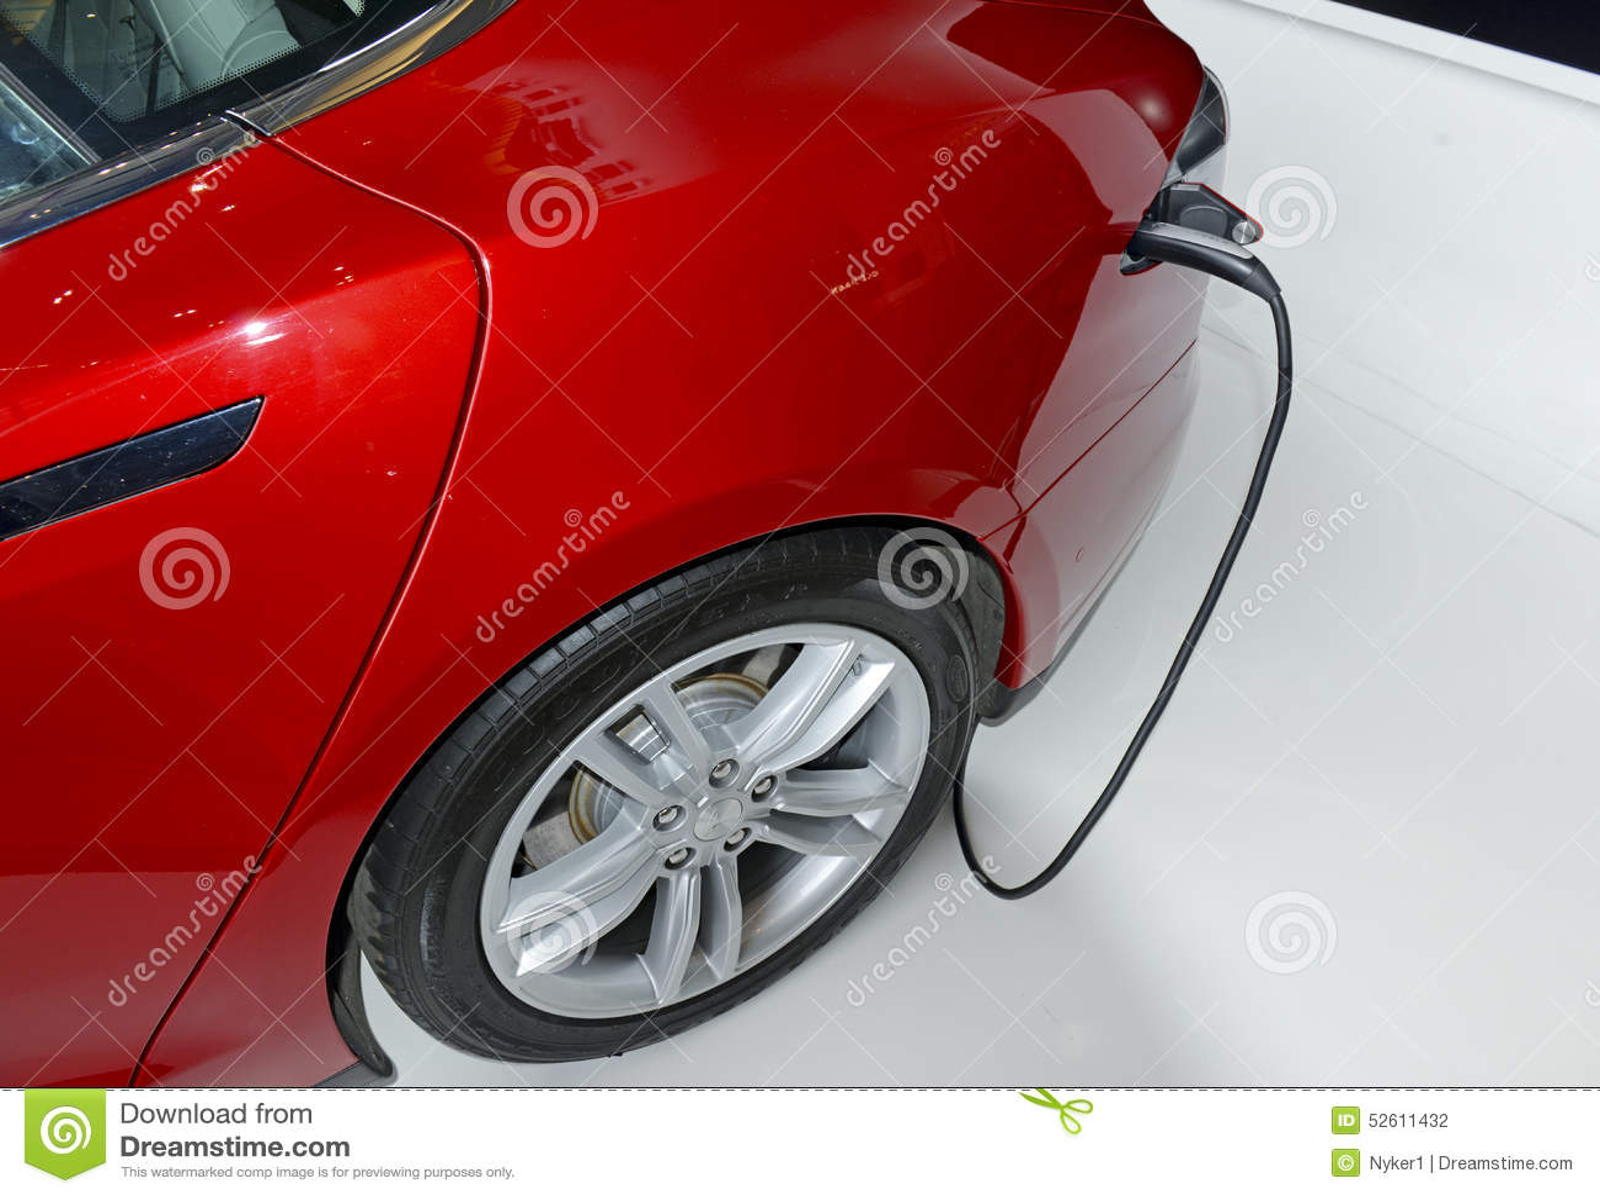 Tesla Motors Model S On Display In New York Editorial Photography Image 52611432